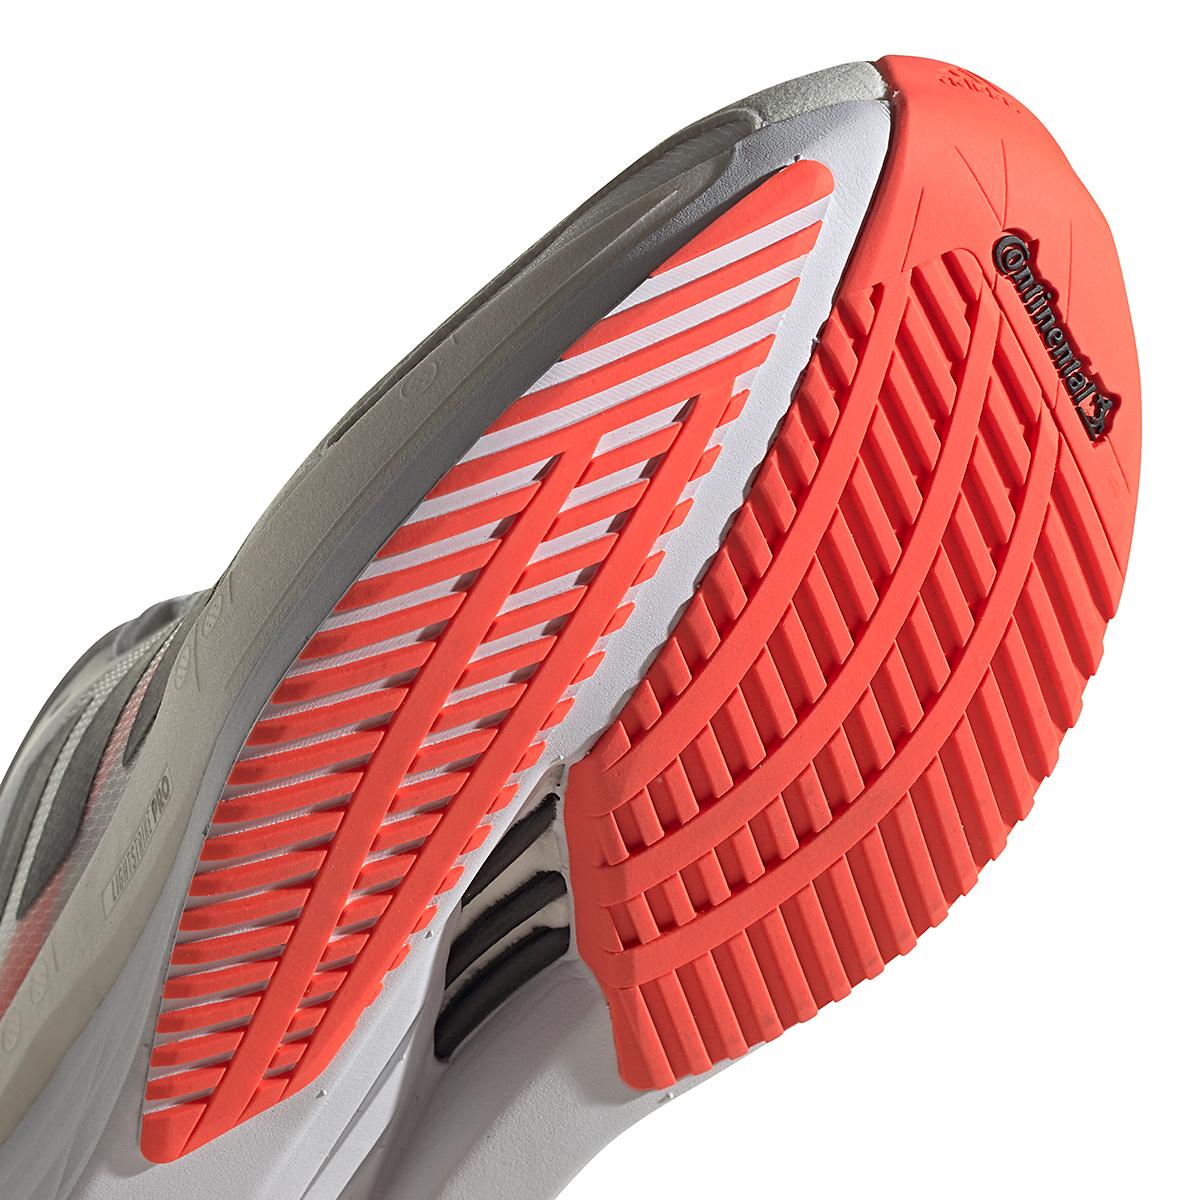 Men's Adidas Adizero Boston 10 Running Shoe - Color: Black/White/Solar Red - Size: 7 - Width: Regular, Black/White/Solar Red, large, image 6